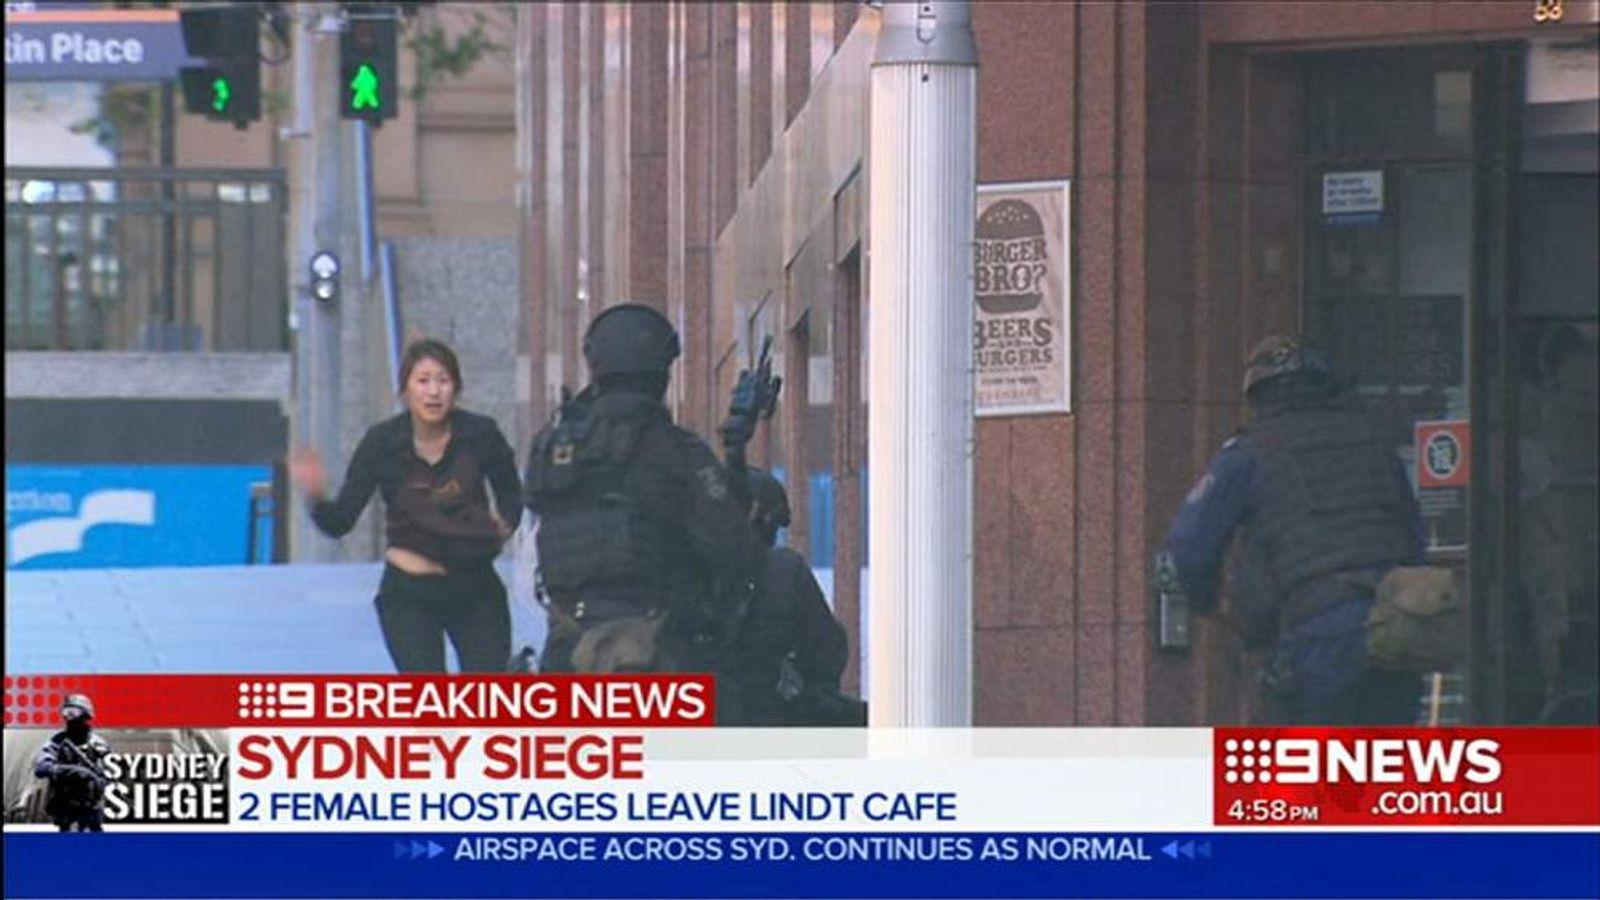 Woman flees Sydney Siege building